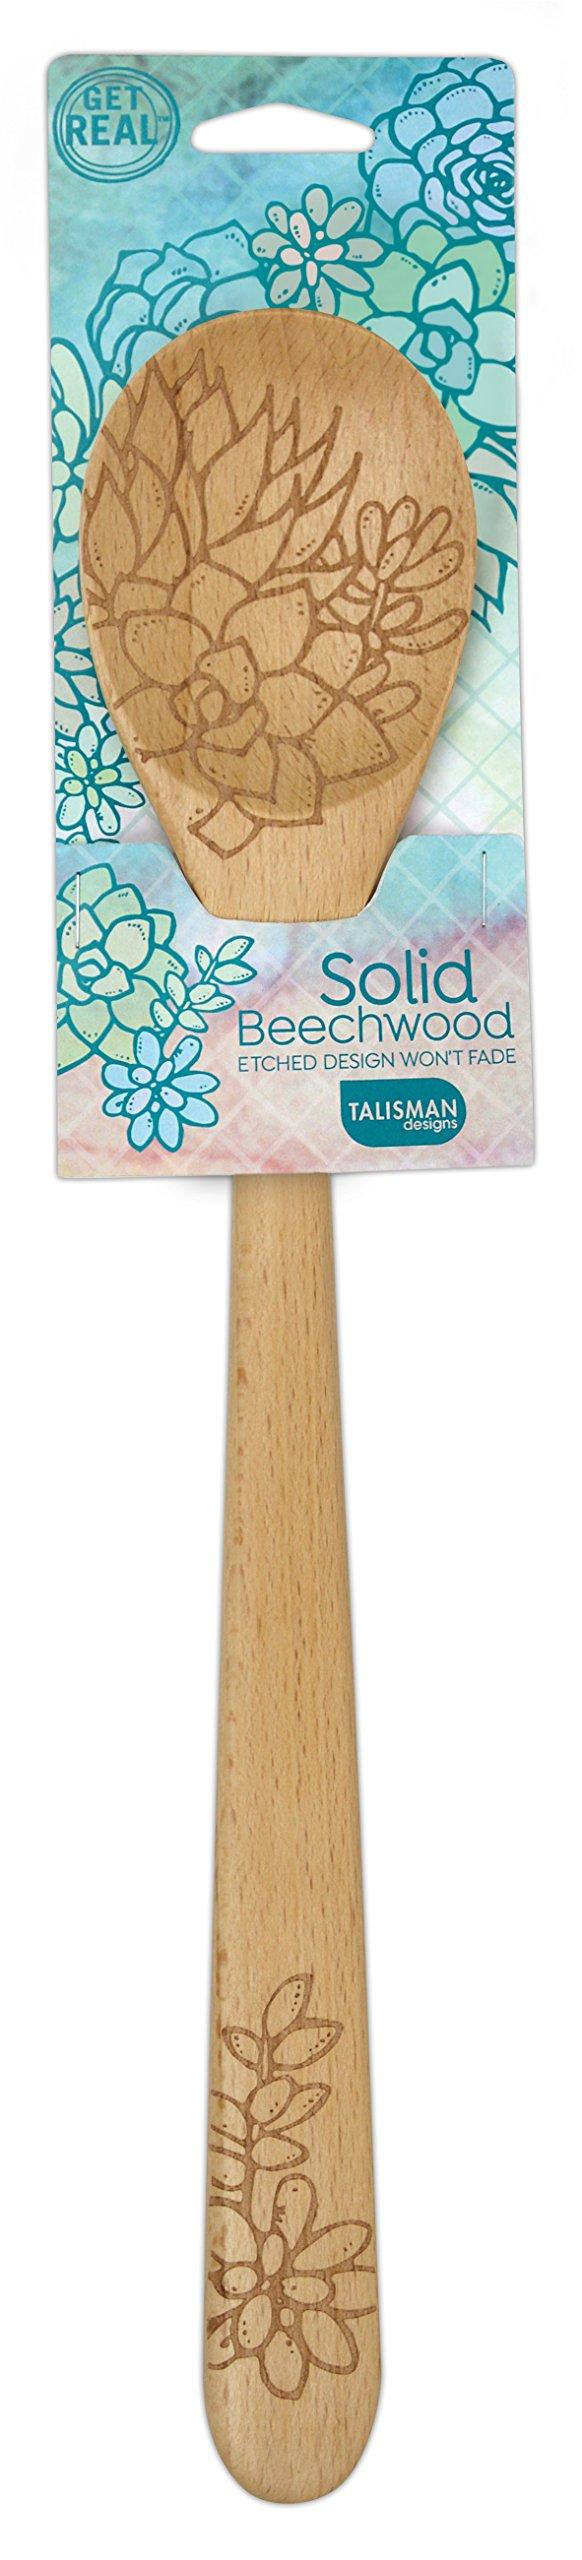 Talisman Designs 1996 Succulents Design Beechwood, Sauce Spoon by Talisman Designs (Image #1)